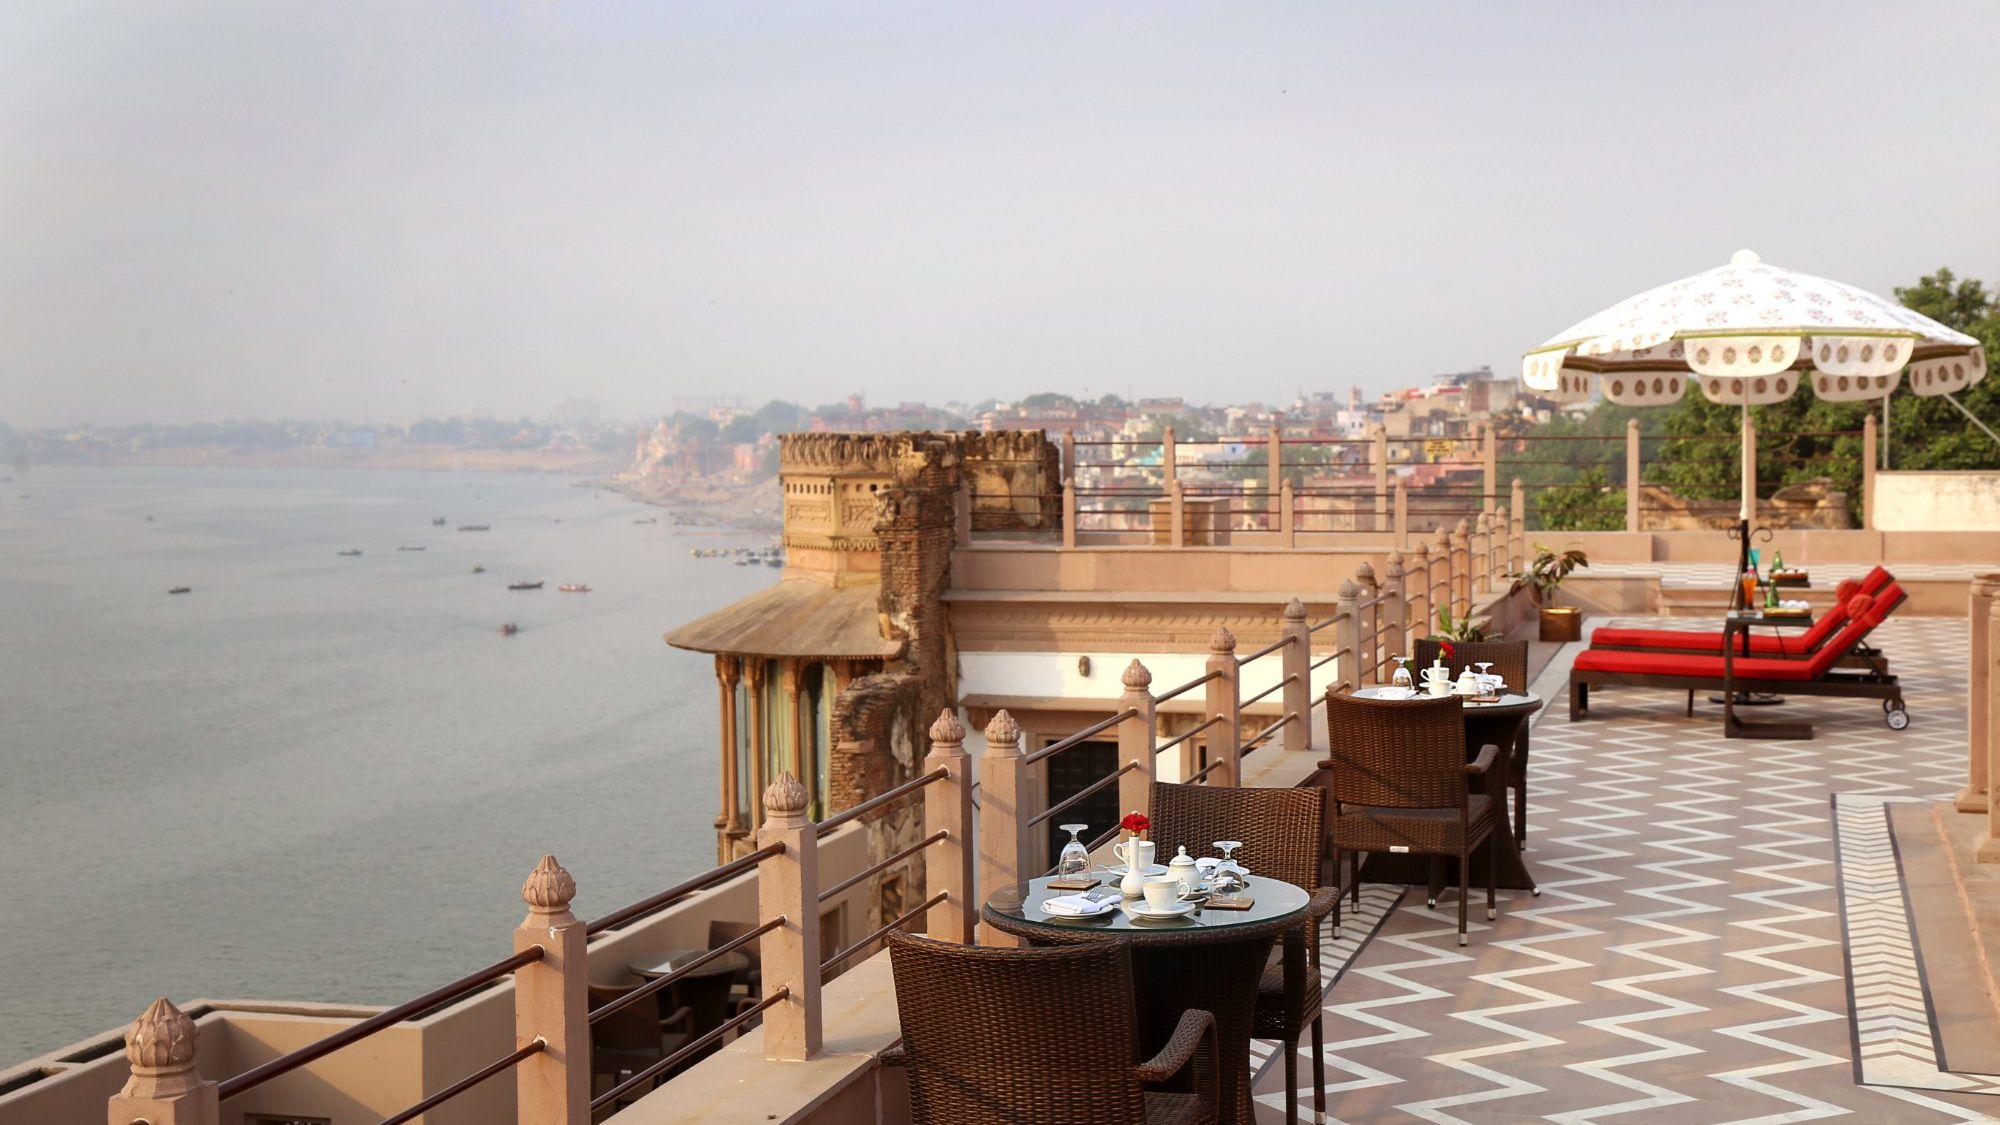 The 9 Best Varanasi Hotels of 2021